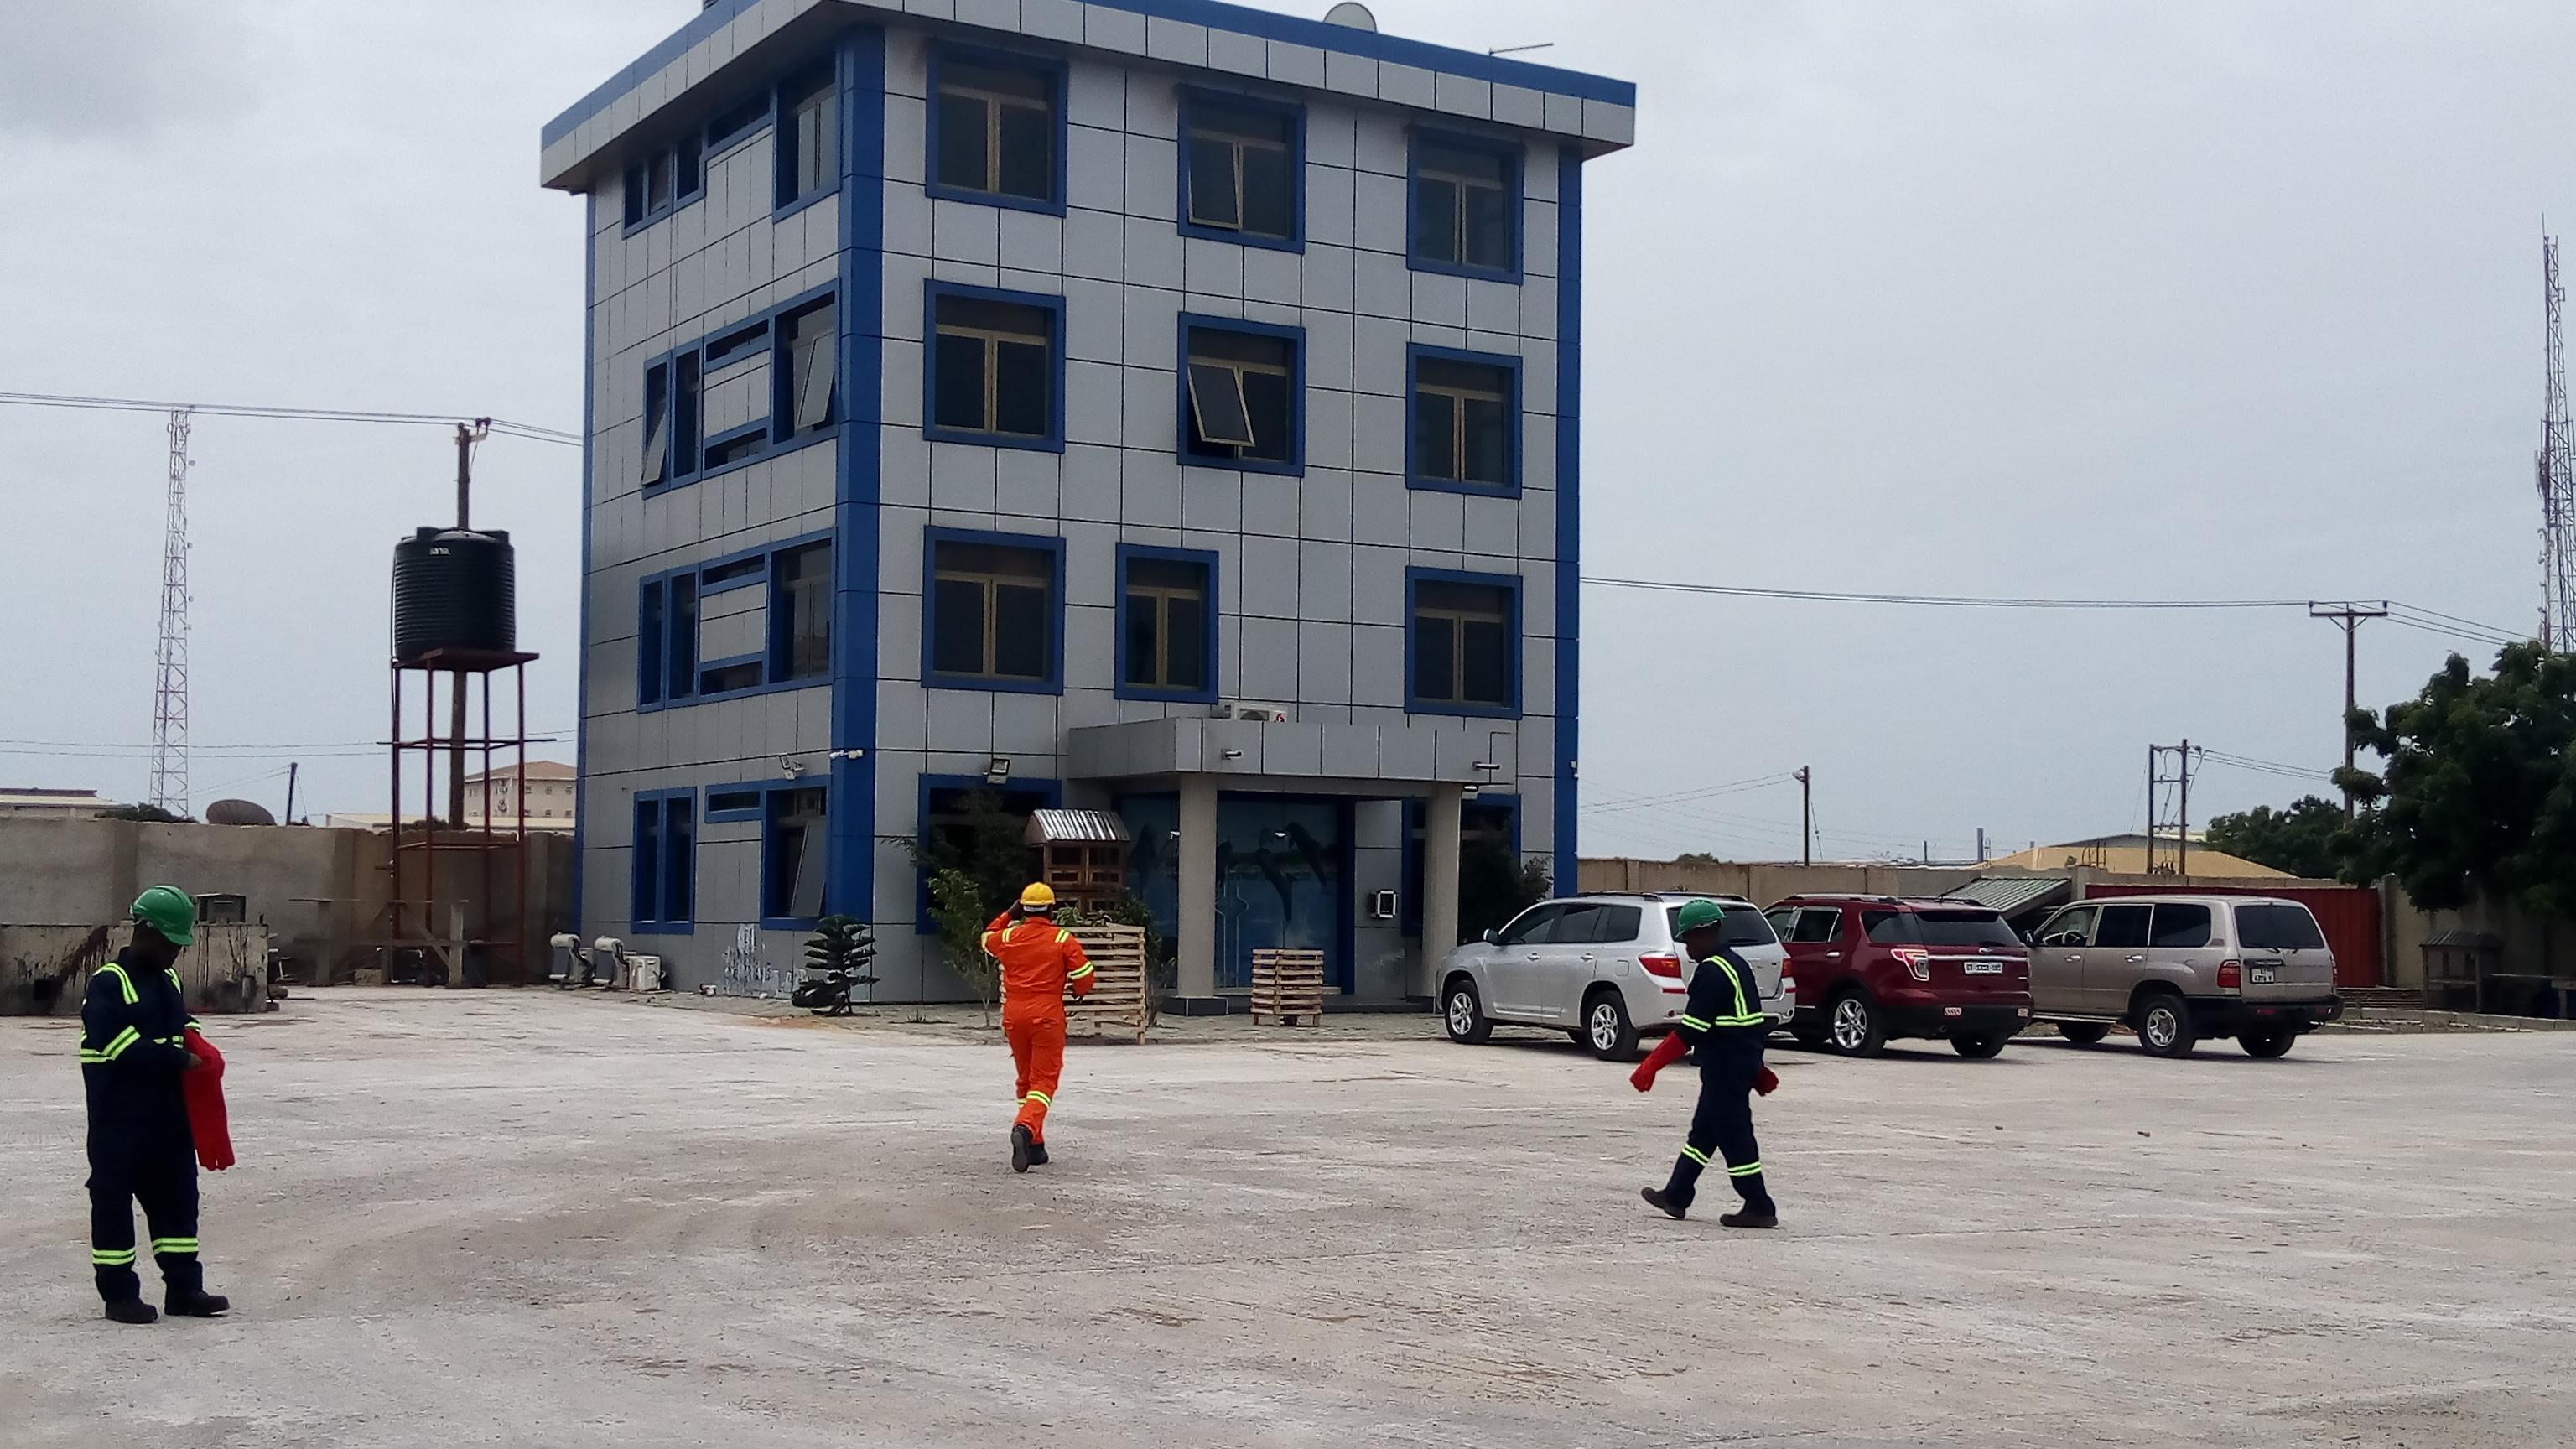 Jokjim Company Ltd